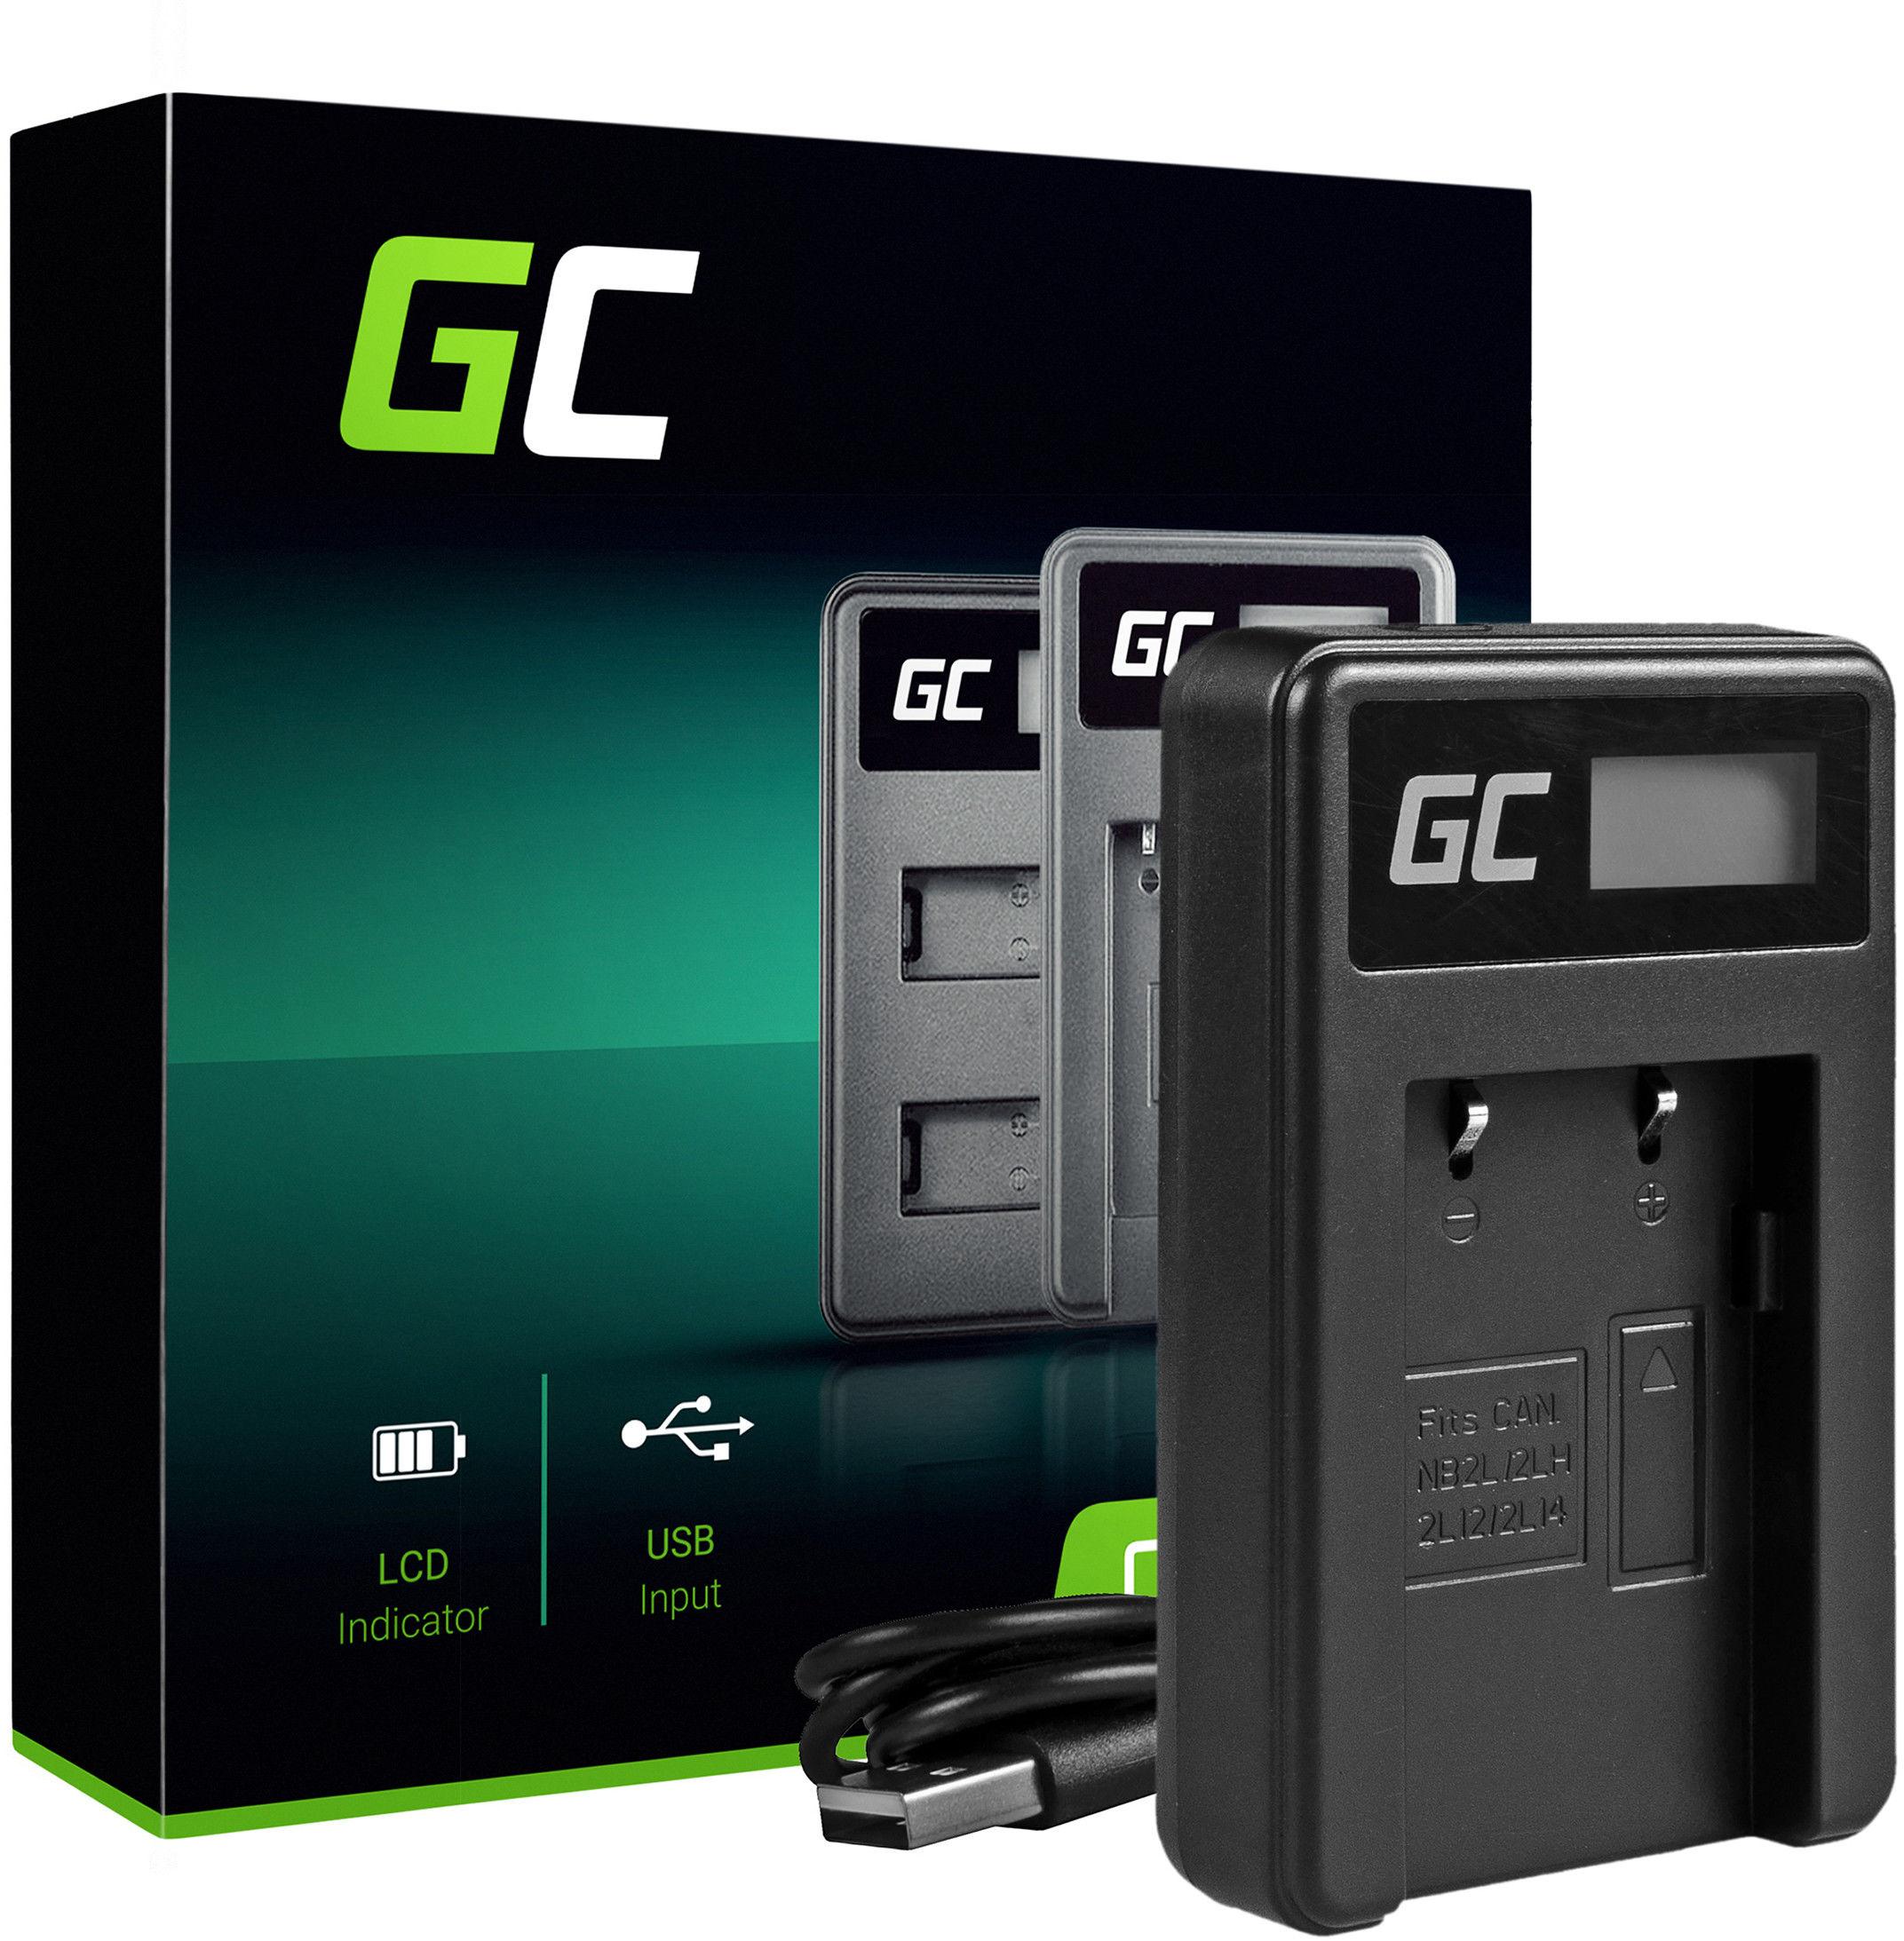 Ładowarka CB-2LW Green Cell  do Canon NB-2L NB-2LH, Digital Rebel XT Elura 50 60 70 80 Optura 30 40 50 60 500 PowerShot G7 S5